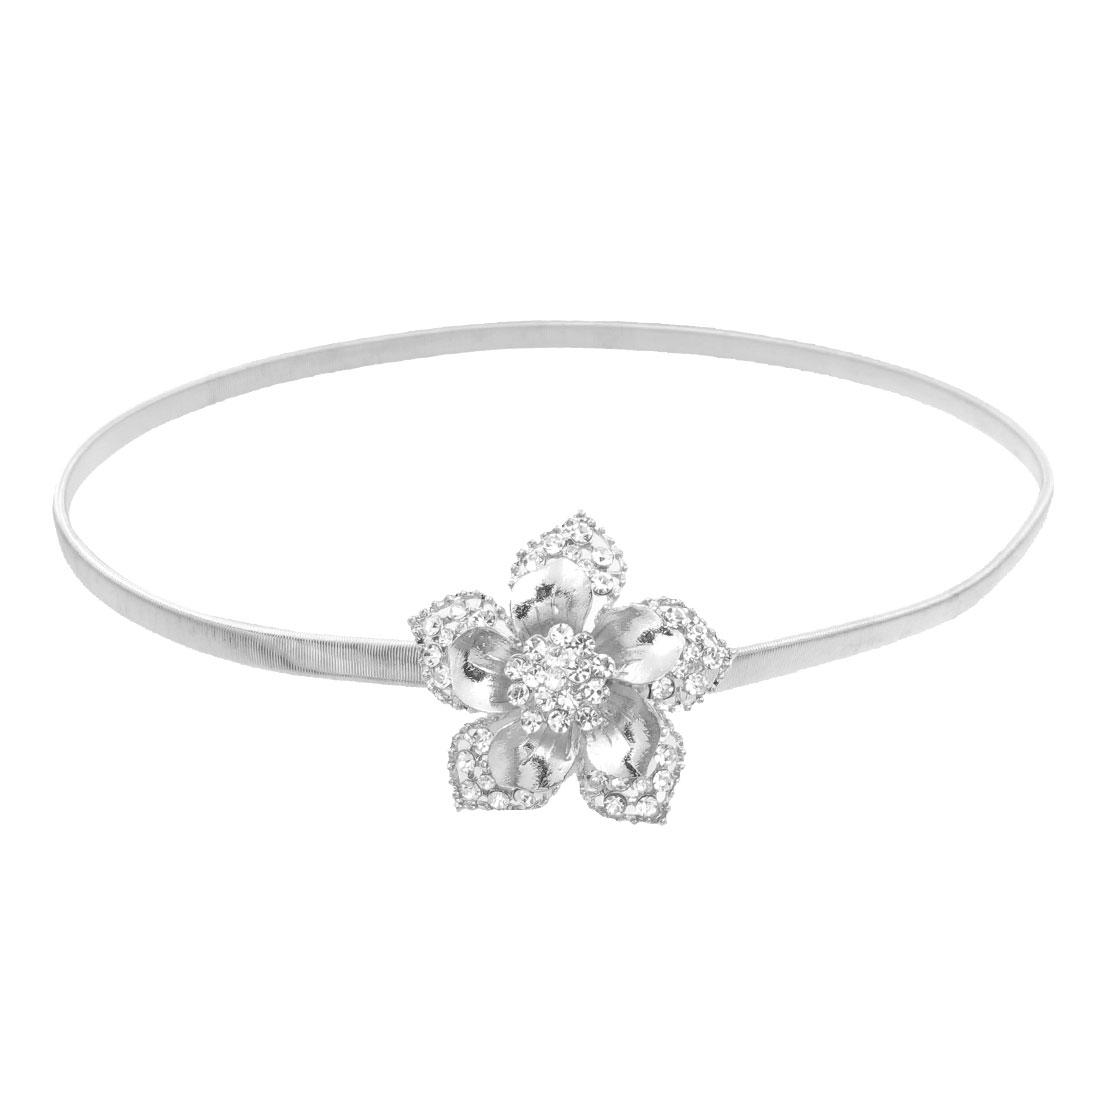 Glittery Rhinestone Detailing Flower Shape Stretchy Waist Chain Silver Tone